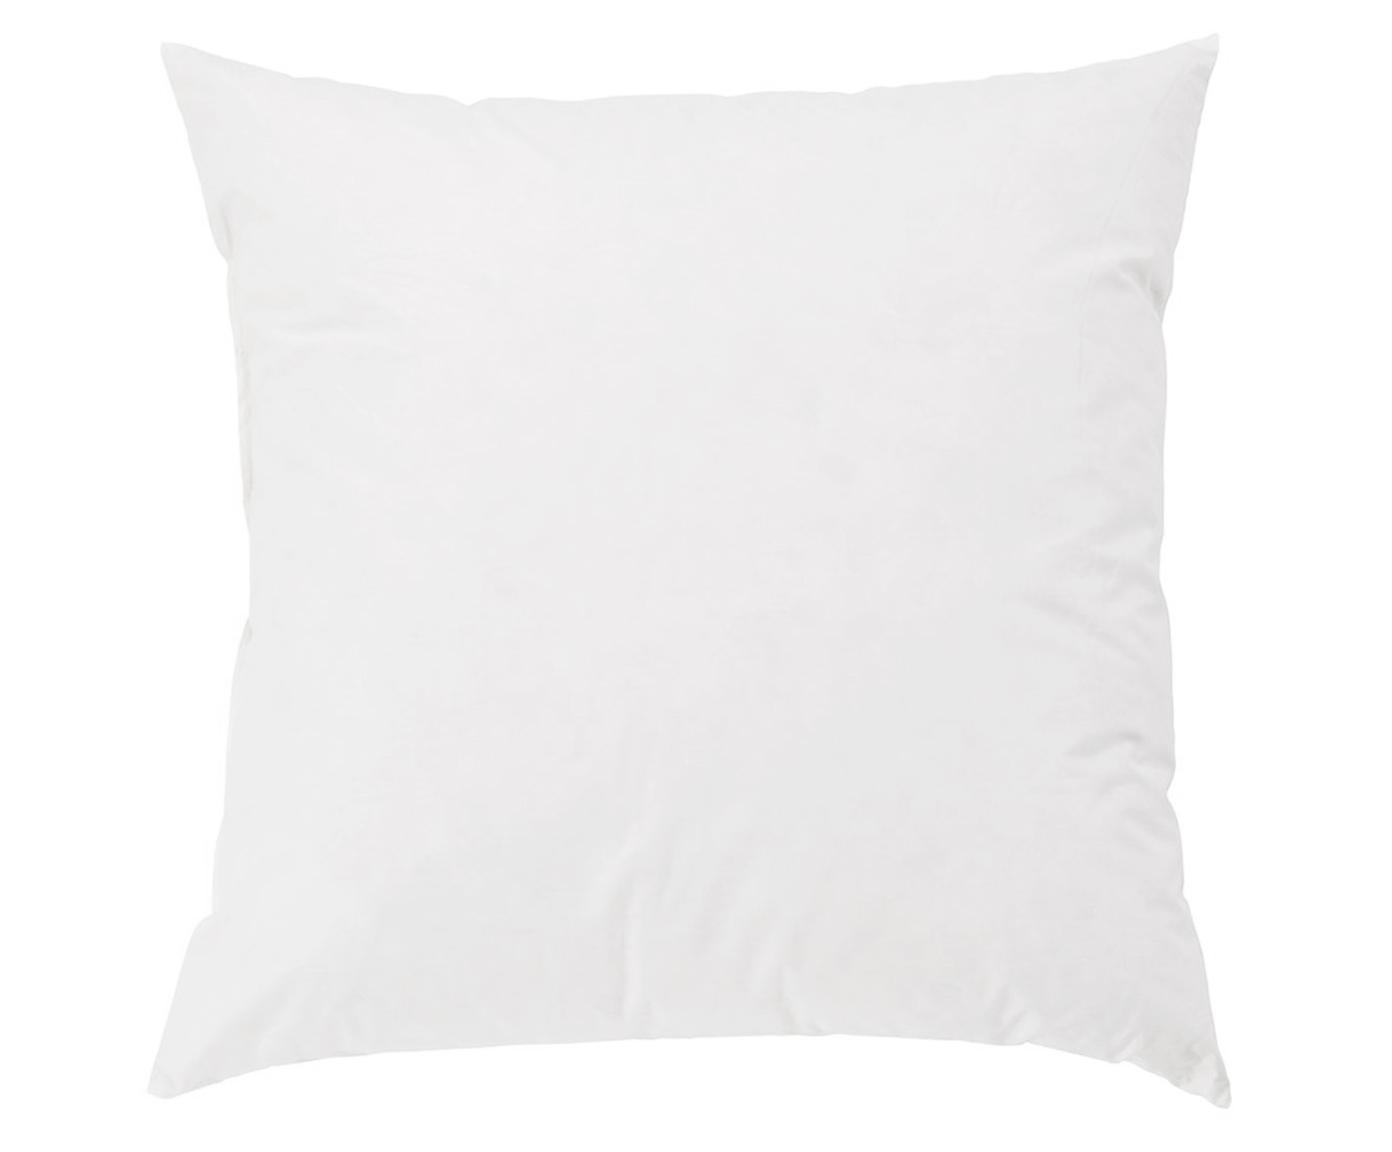 Relleno de cojín Komfort, 45x45, Funda: percal Mako, 100%algodón, Blanco, An 45 x L 45 cm